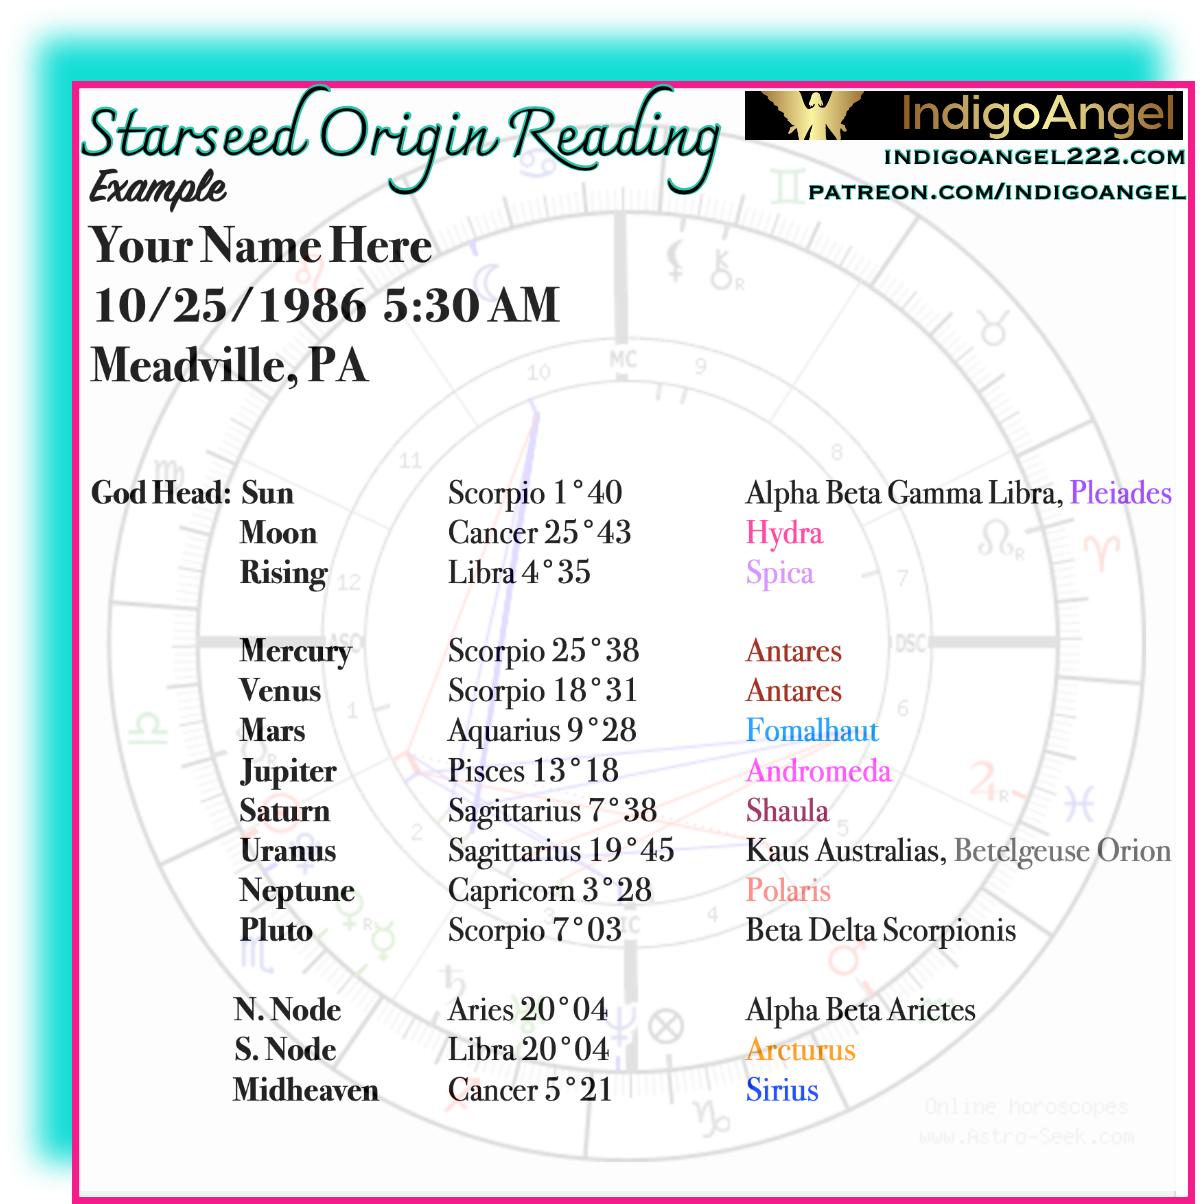 Starseed Origin Chart/In-Depth Reading